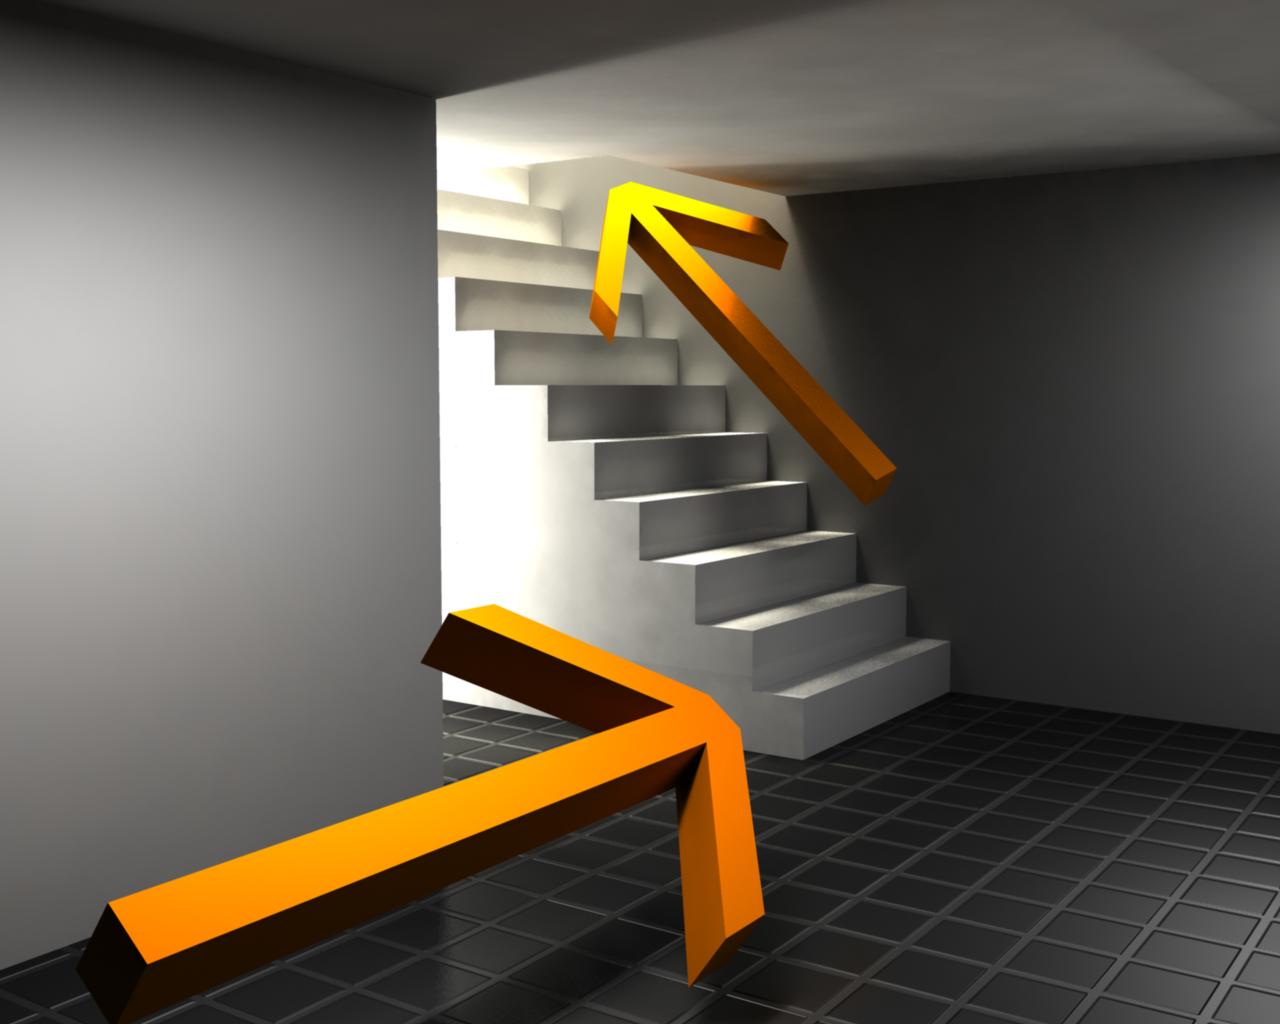 Follow the bright orange arrow